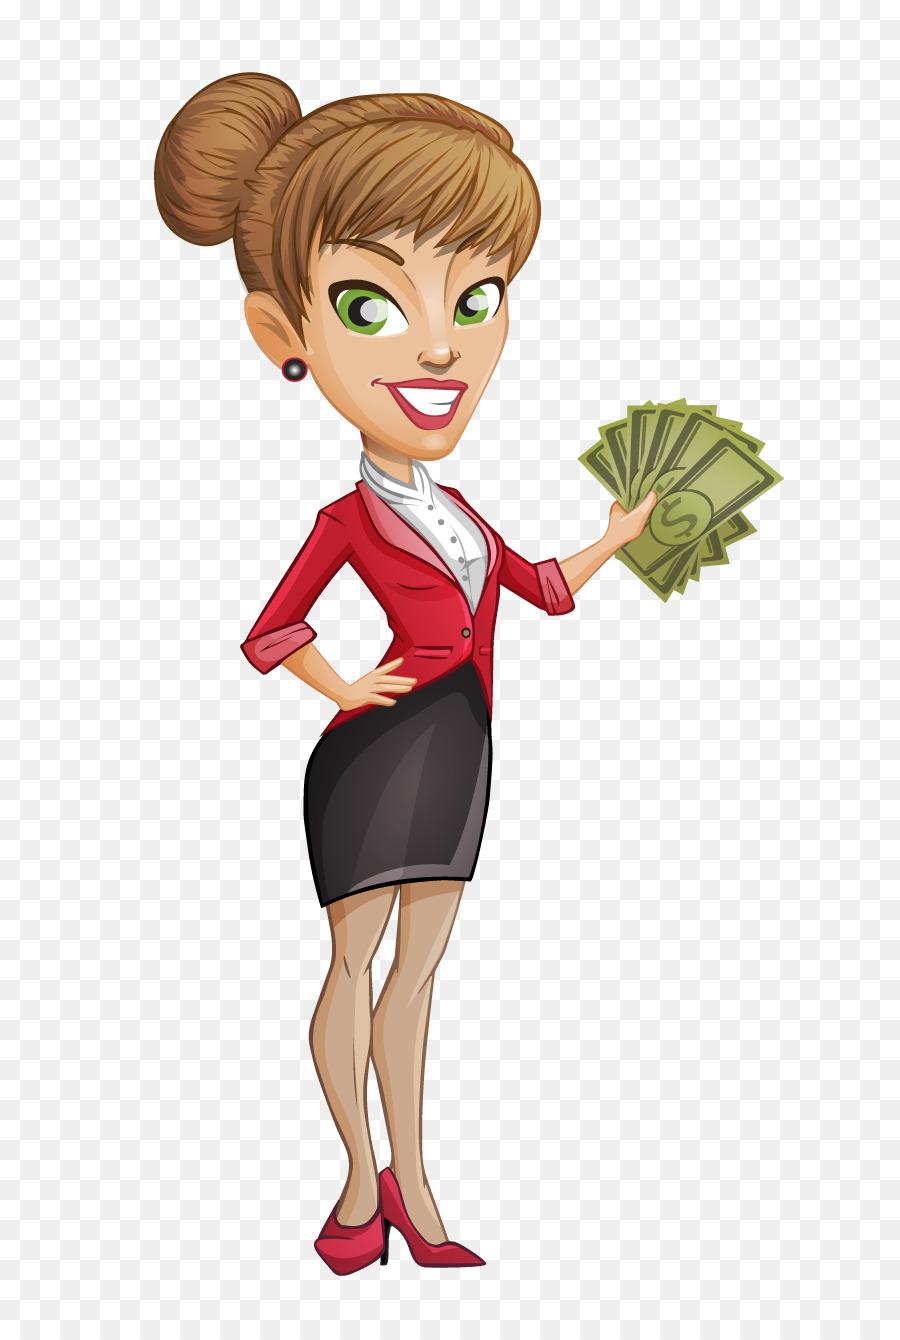 Businesswoman clipart transparent. Payday loan hard money